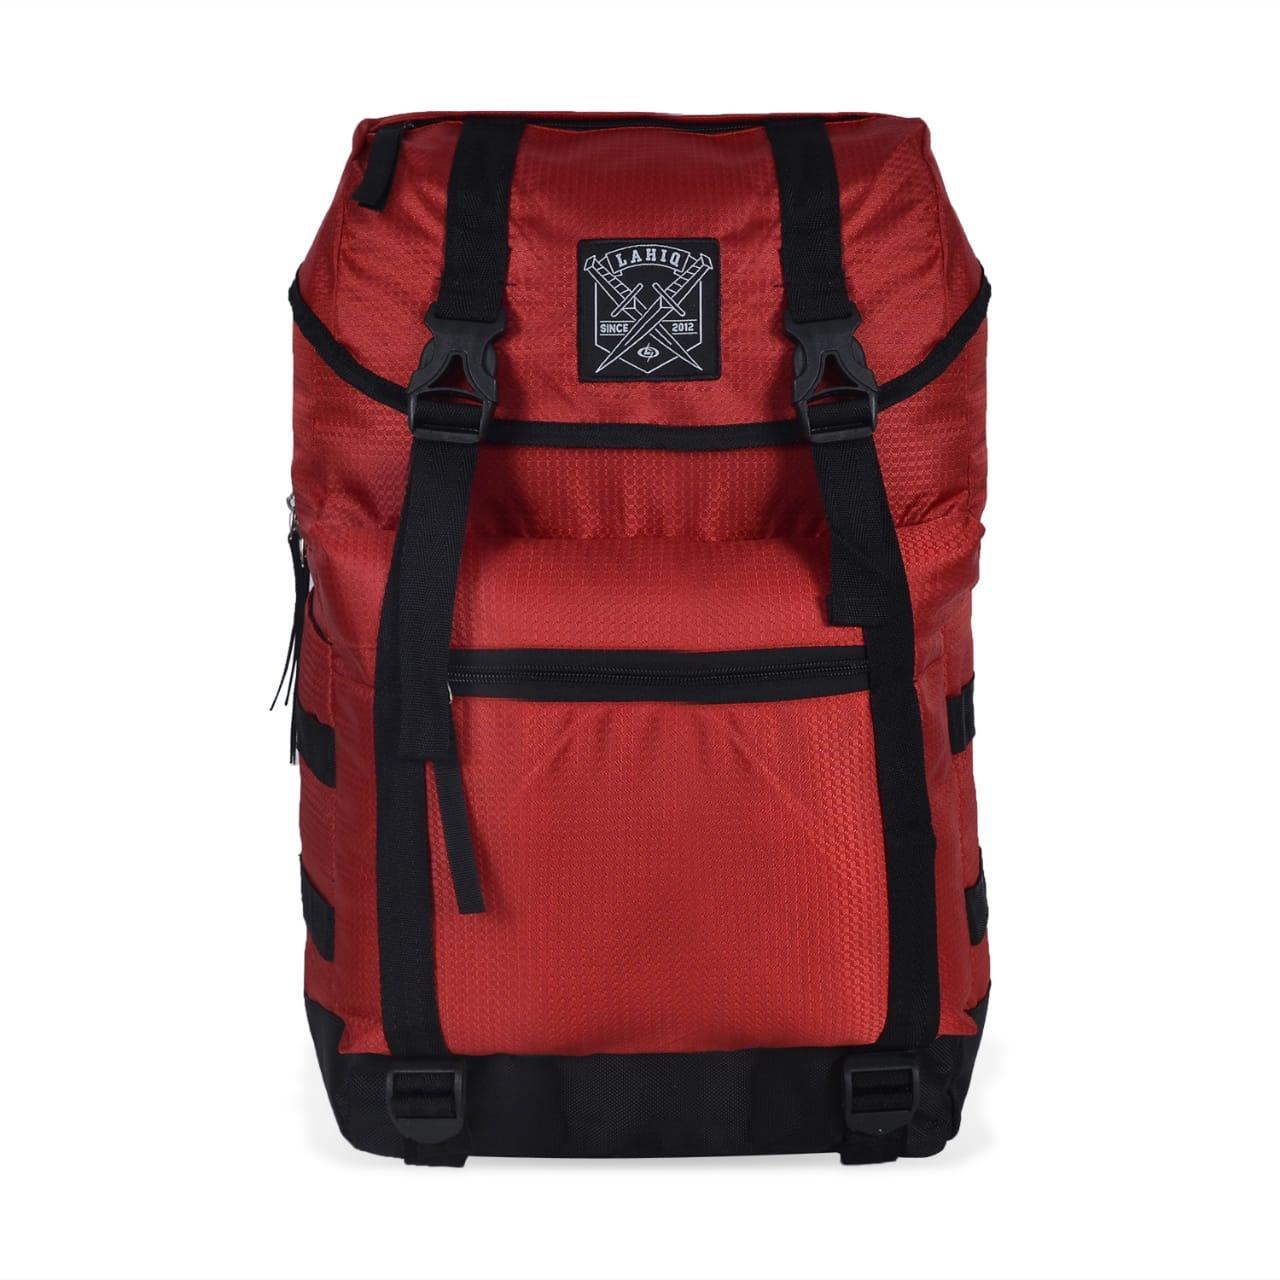 Tas Ransel Pria Dan Wanita Tas Kerja Tas Kuliah Tas Backpack 002-01 By Skyshop Collection.